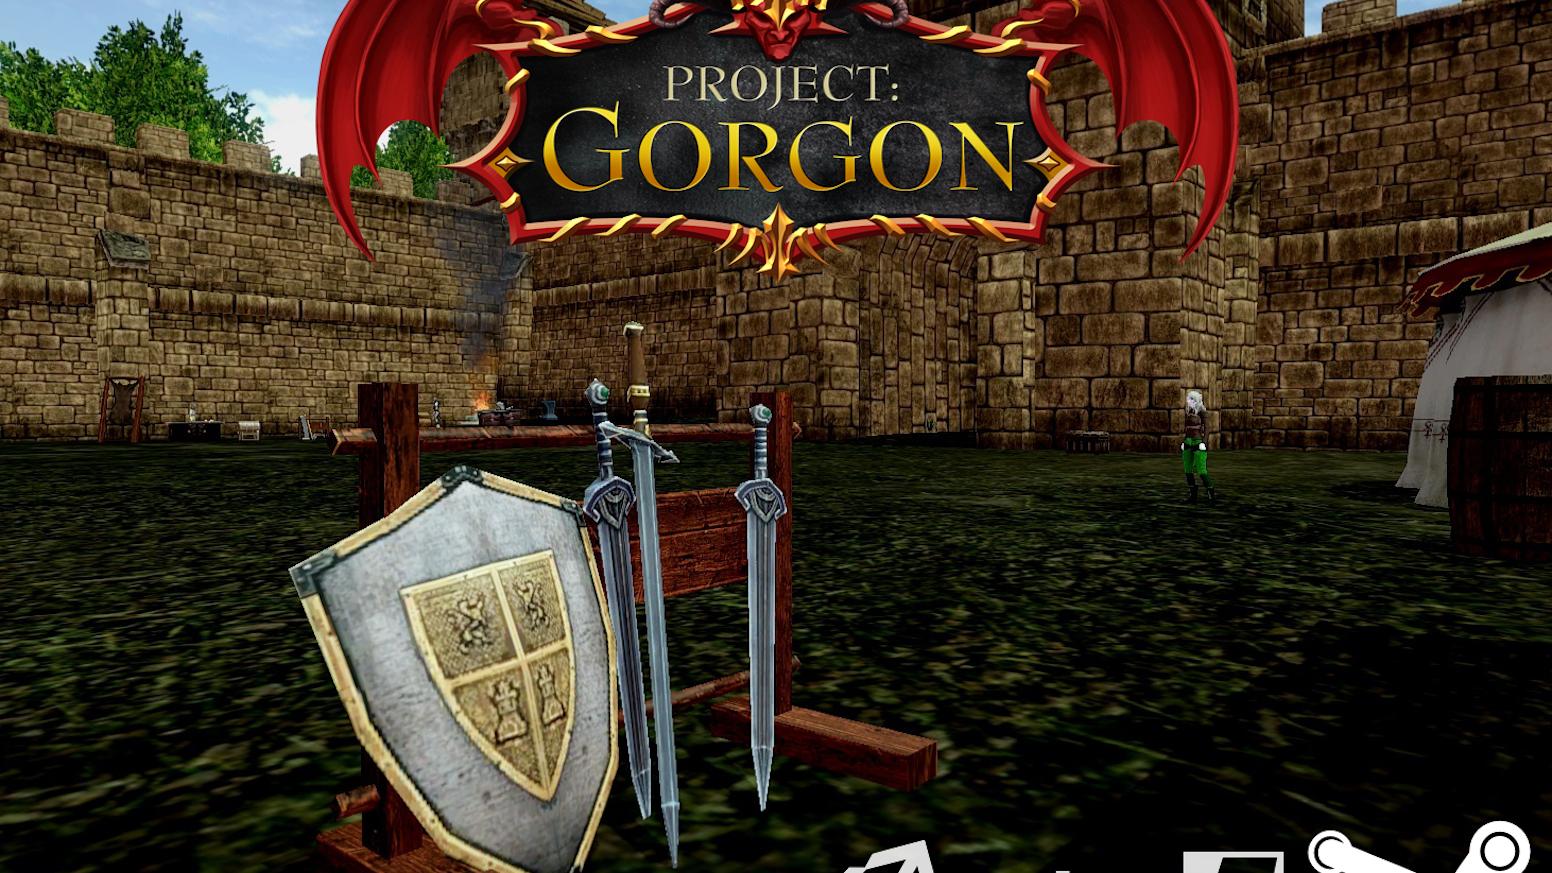 Project: Gorgon - PC MMO by Elder Game, LLC  — Kickstarter